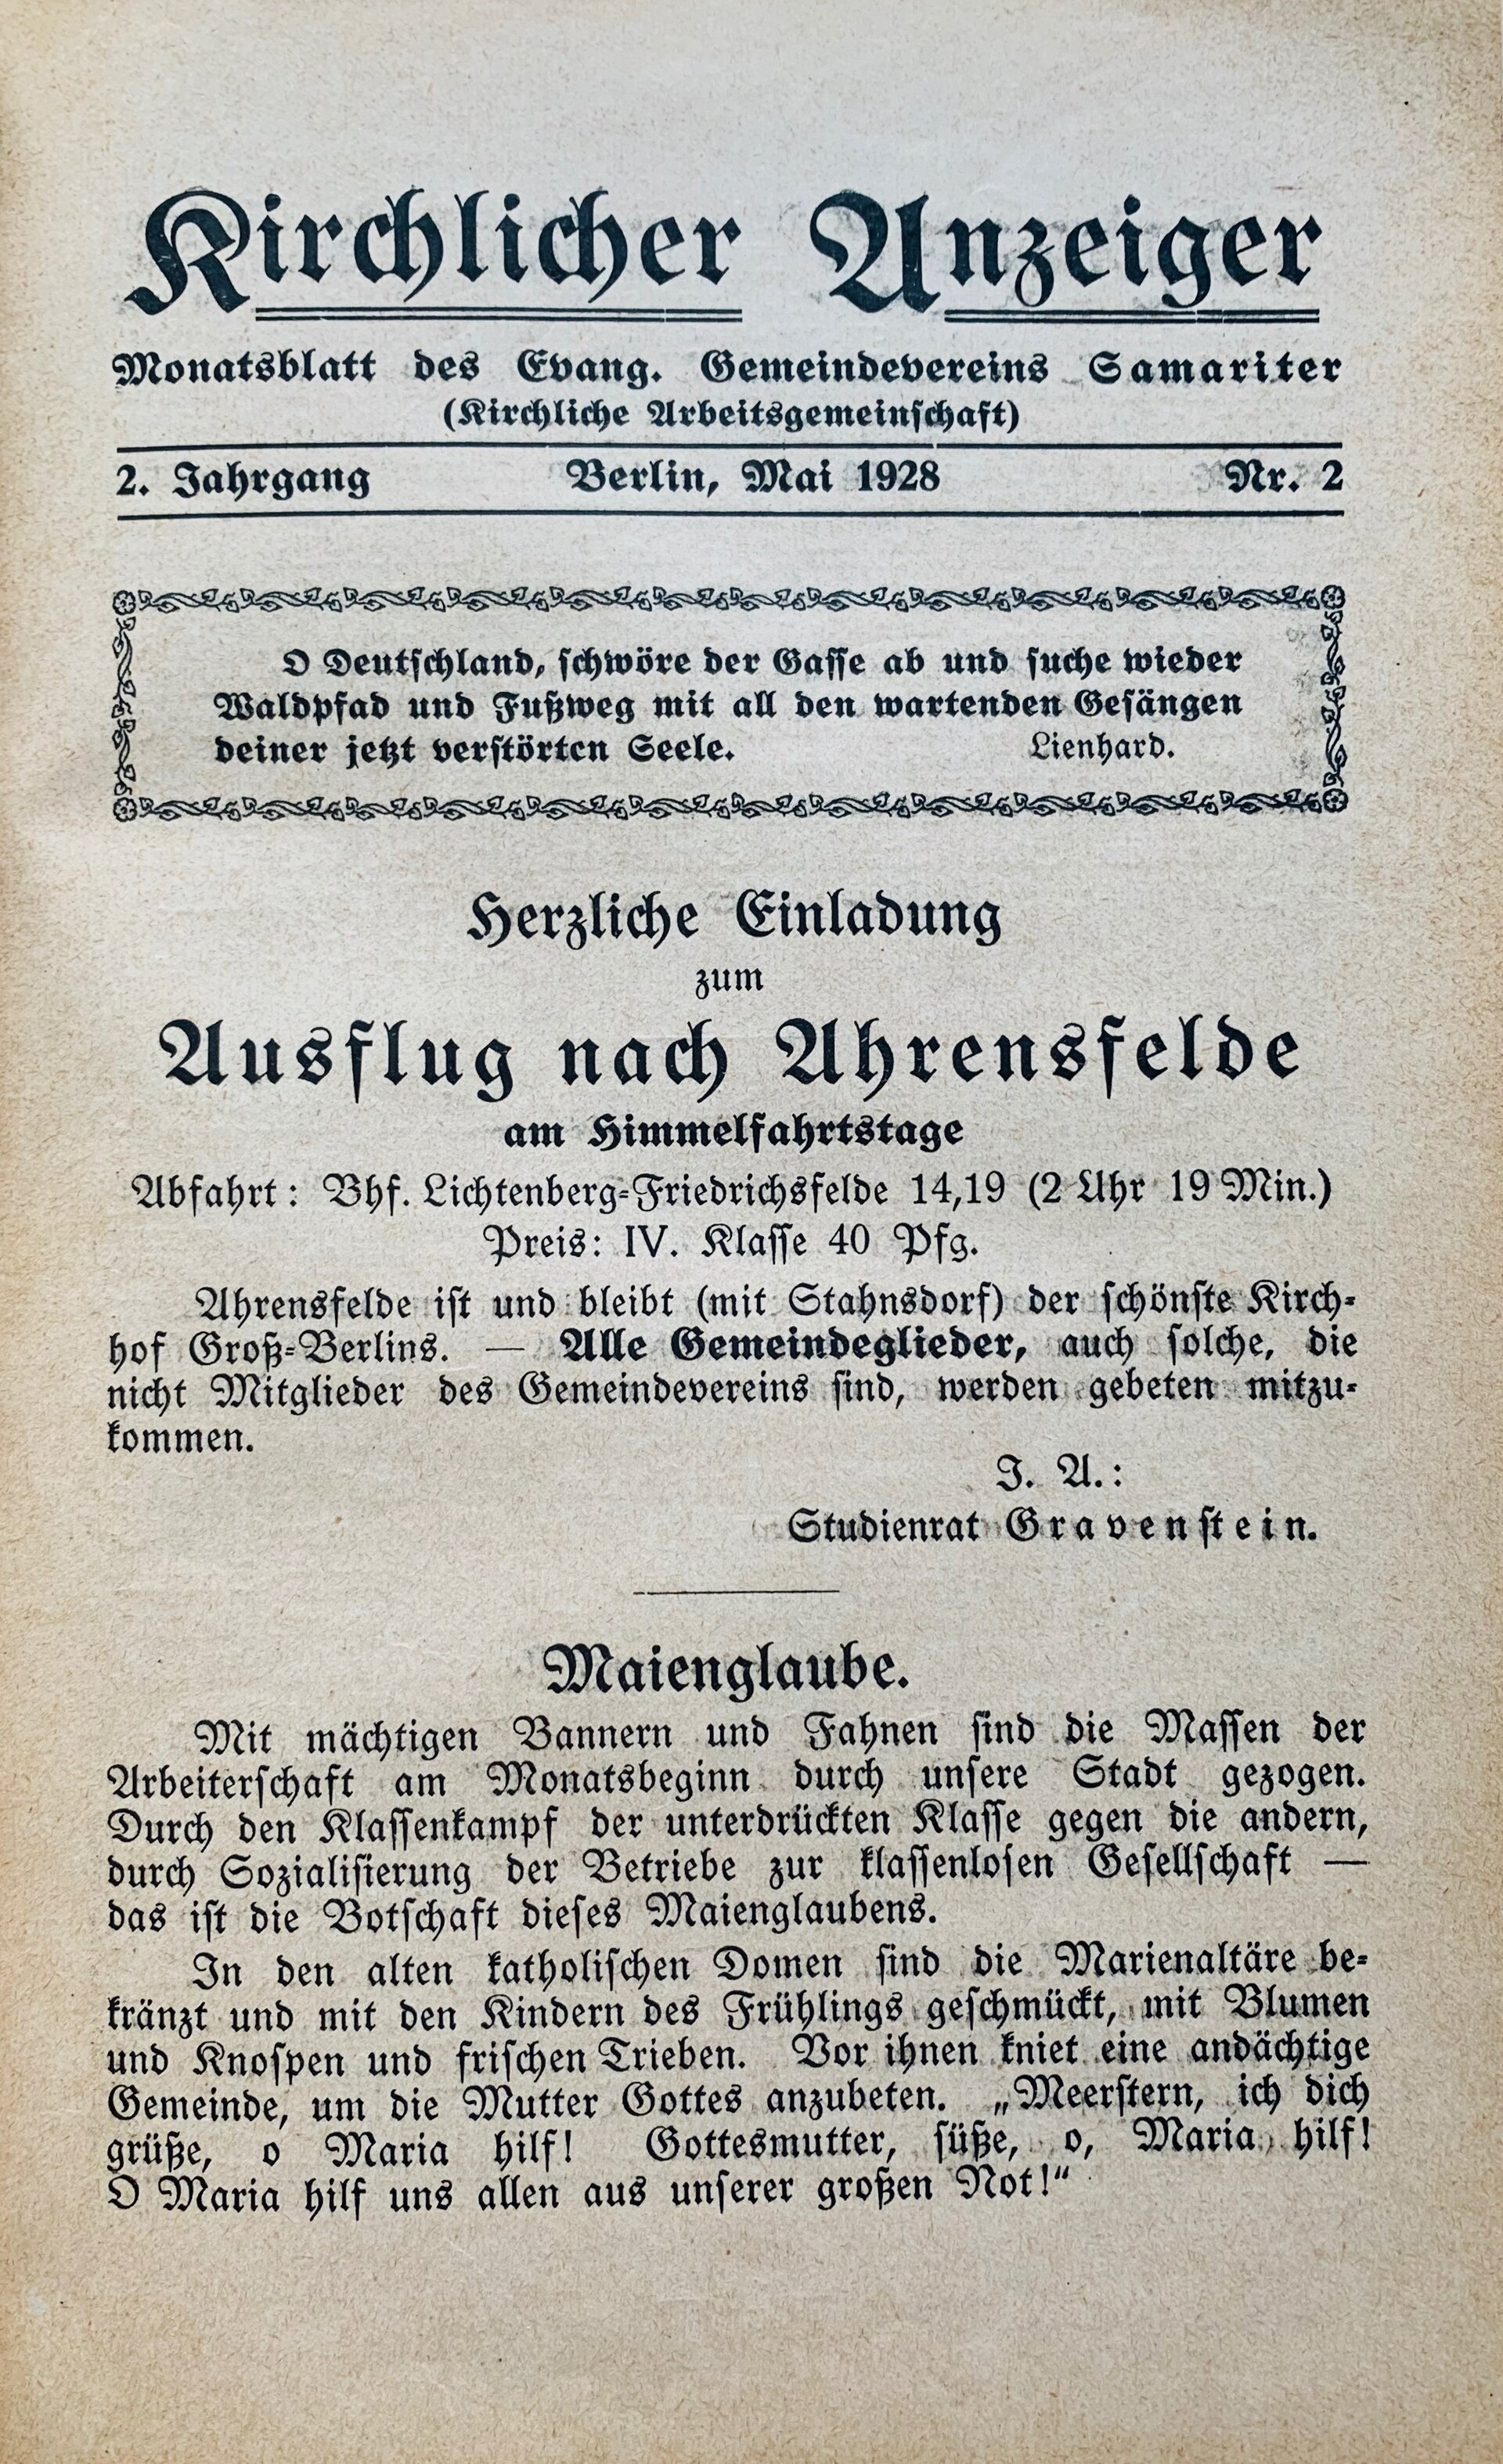 Kirchlicher Anzeiger, Mai 1928